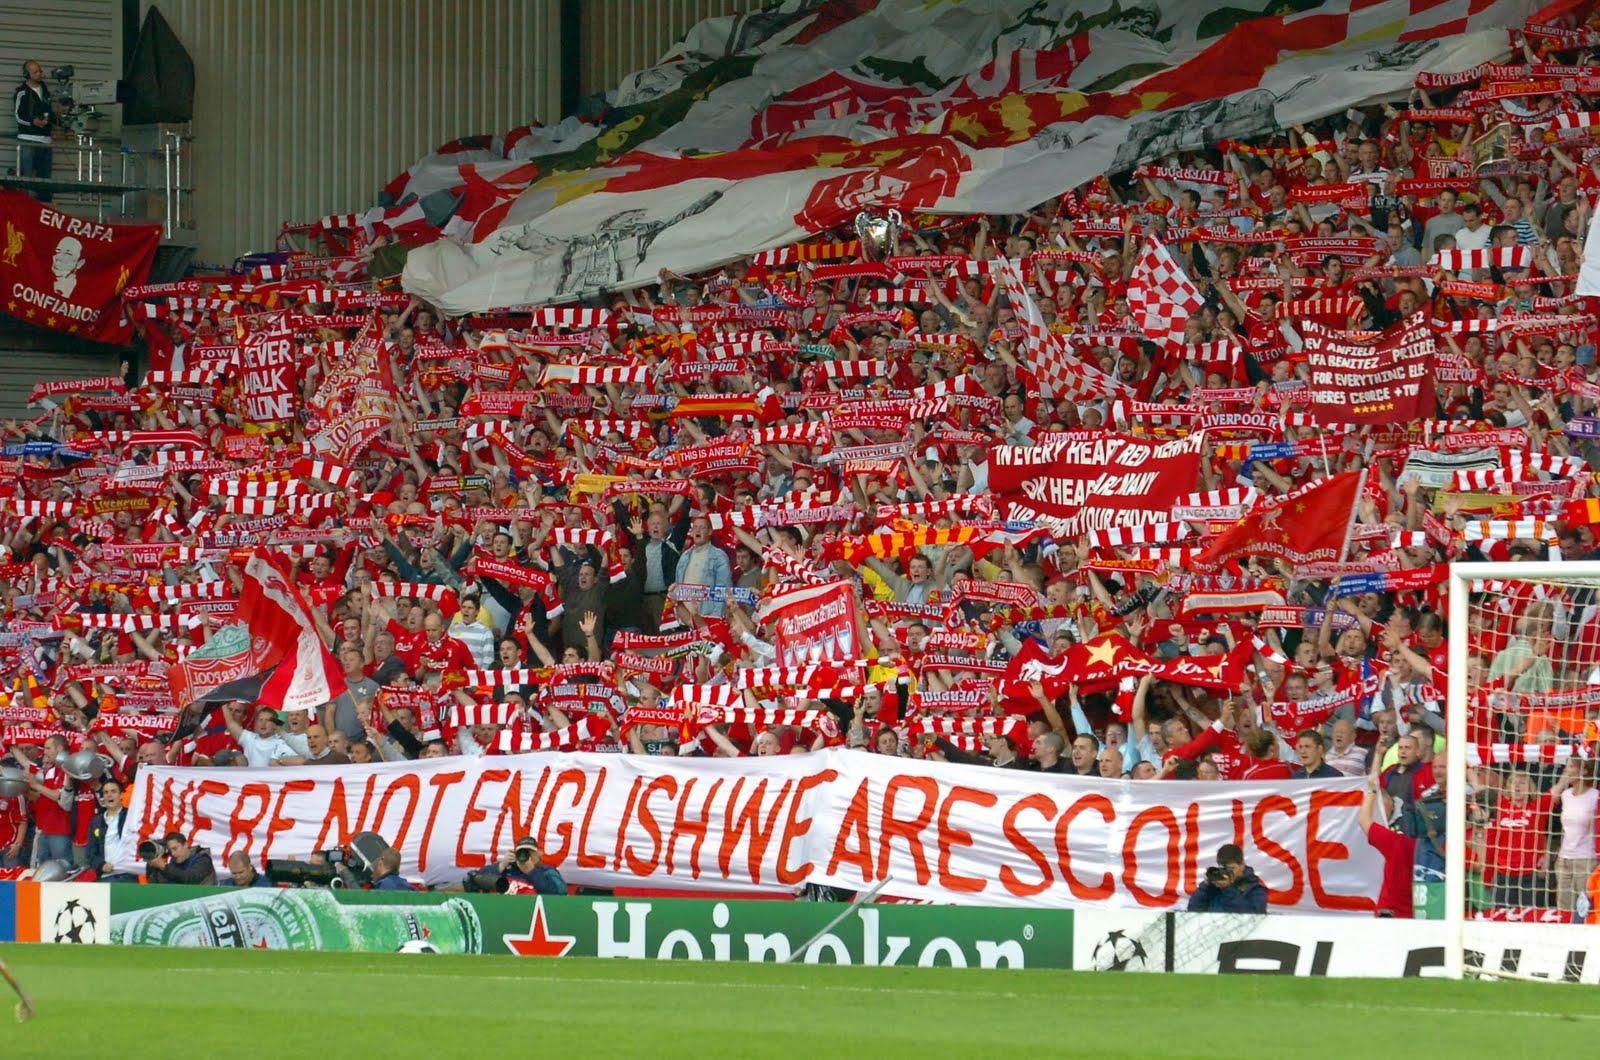 Liverpool Fc: Best Celebrity: Liverpool Football Club